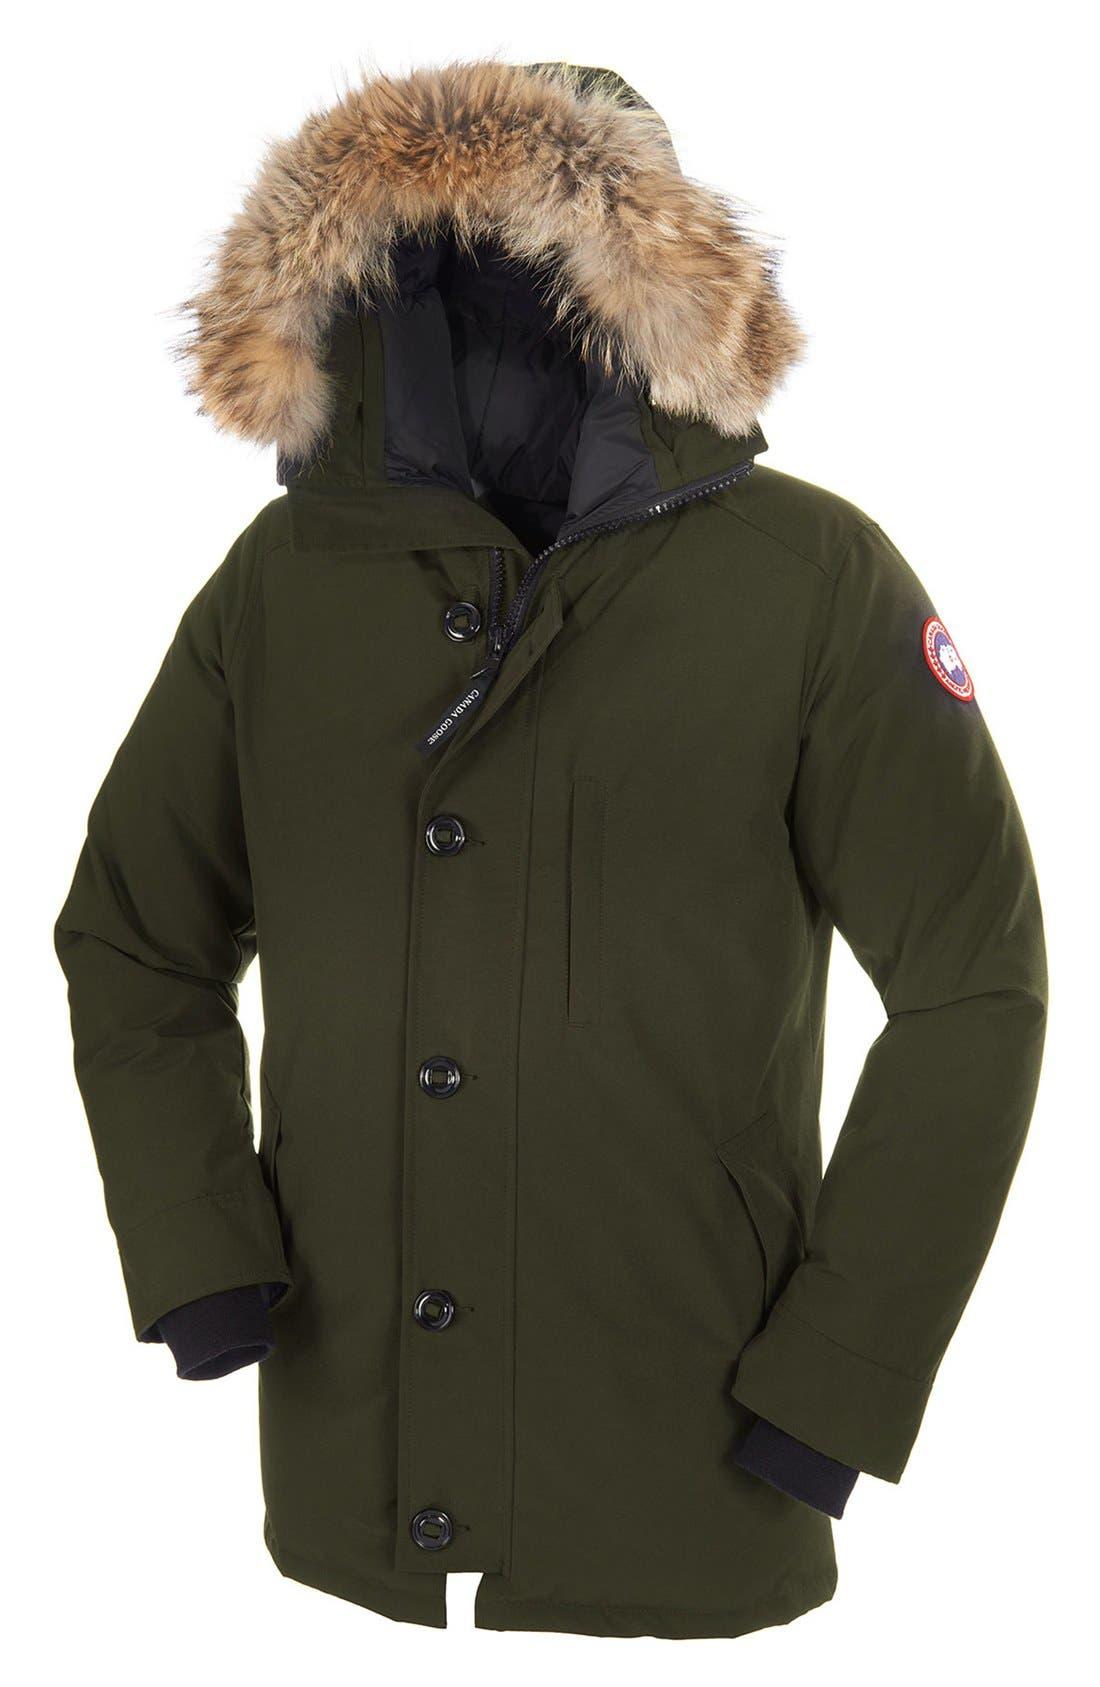 'Chateau' Slim Fit Genuine Coyote Fur Trim Jacket,                             Alternate thumbnail 4, color,                             Military Green